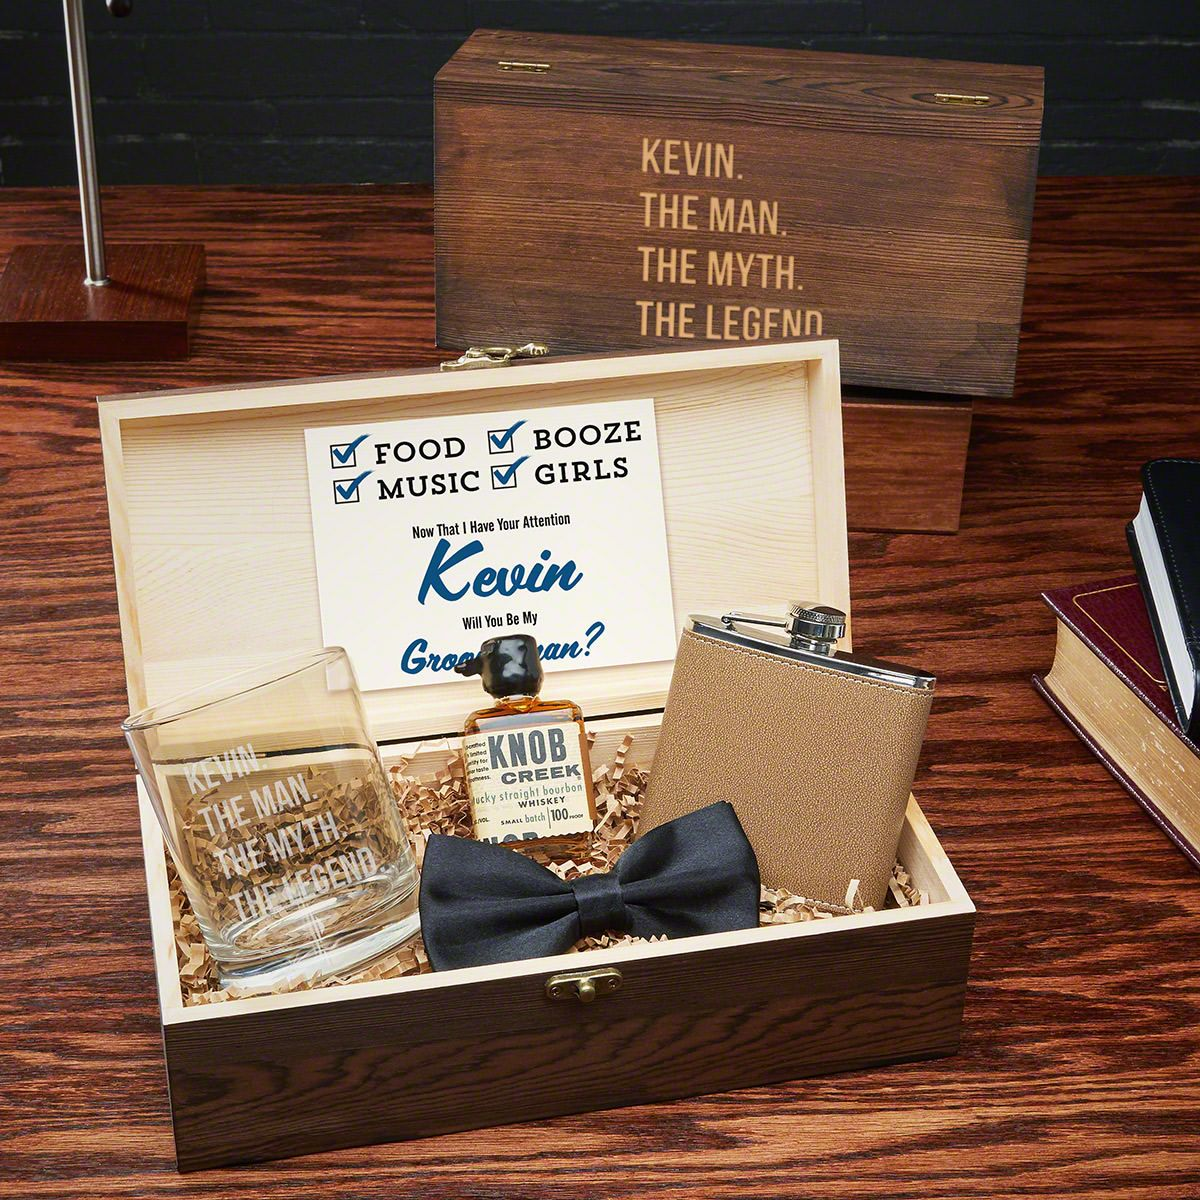 Man the Myth Personalized Groomsmen Gift Box Set